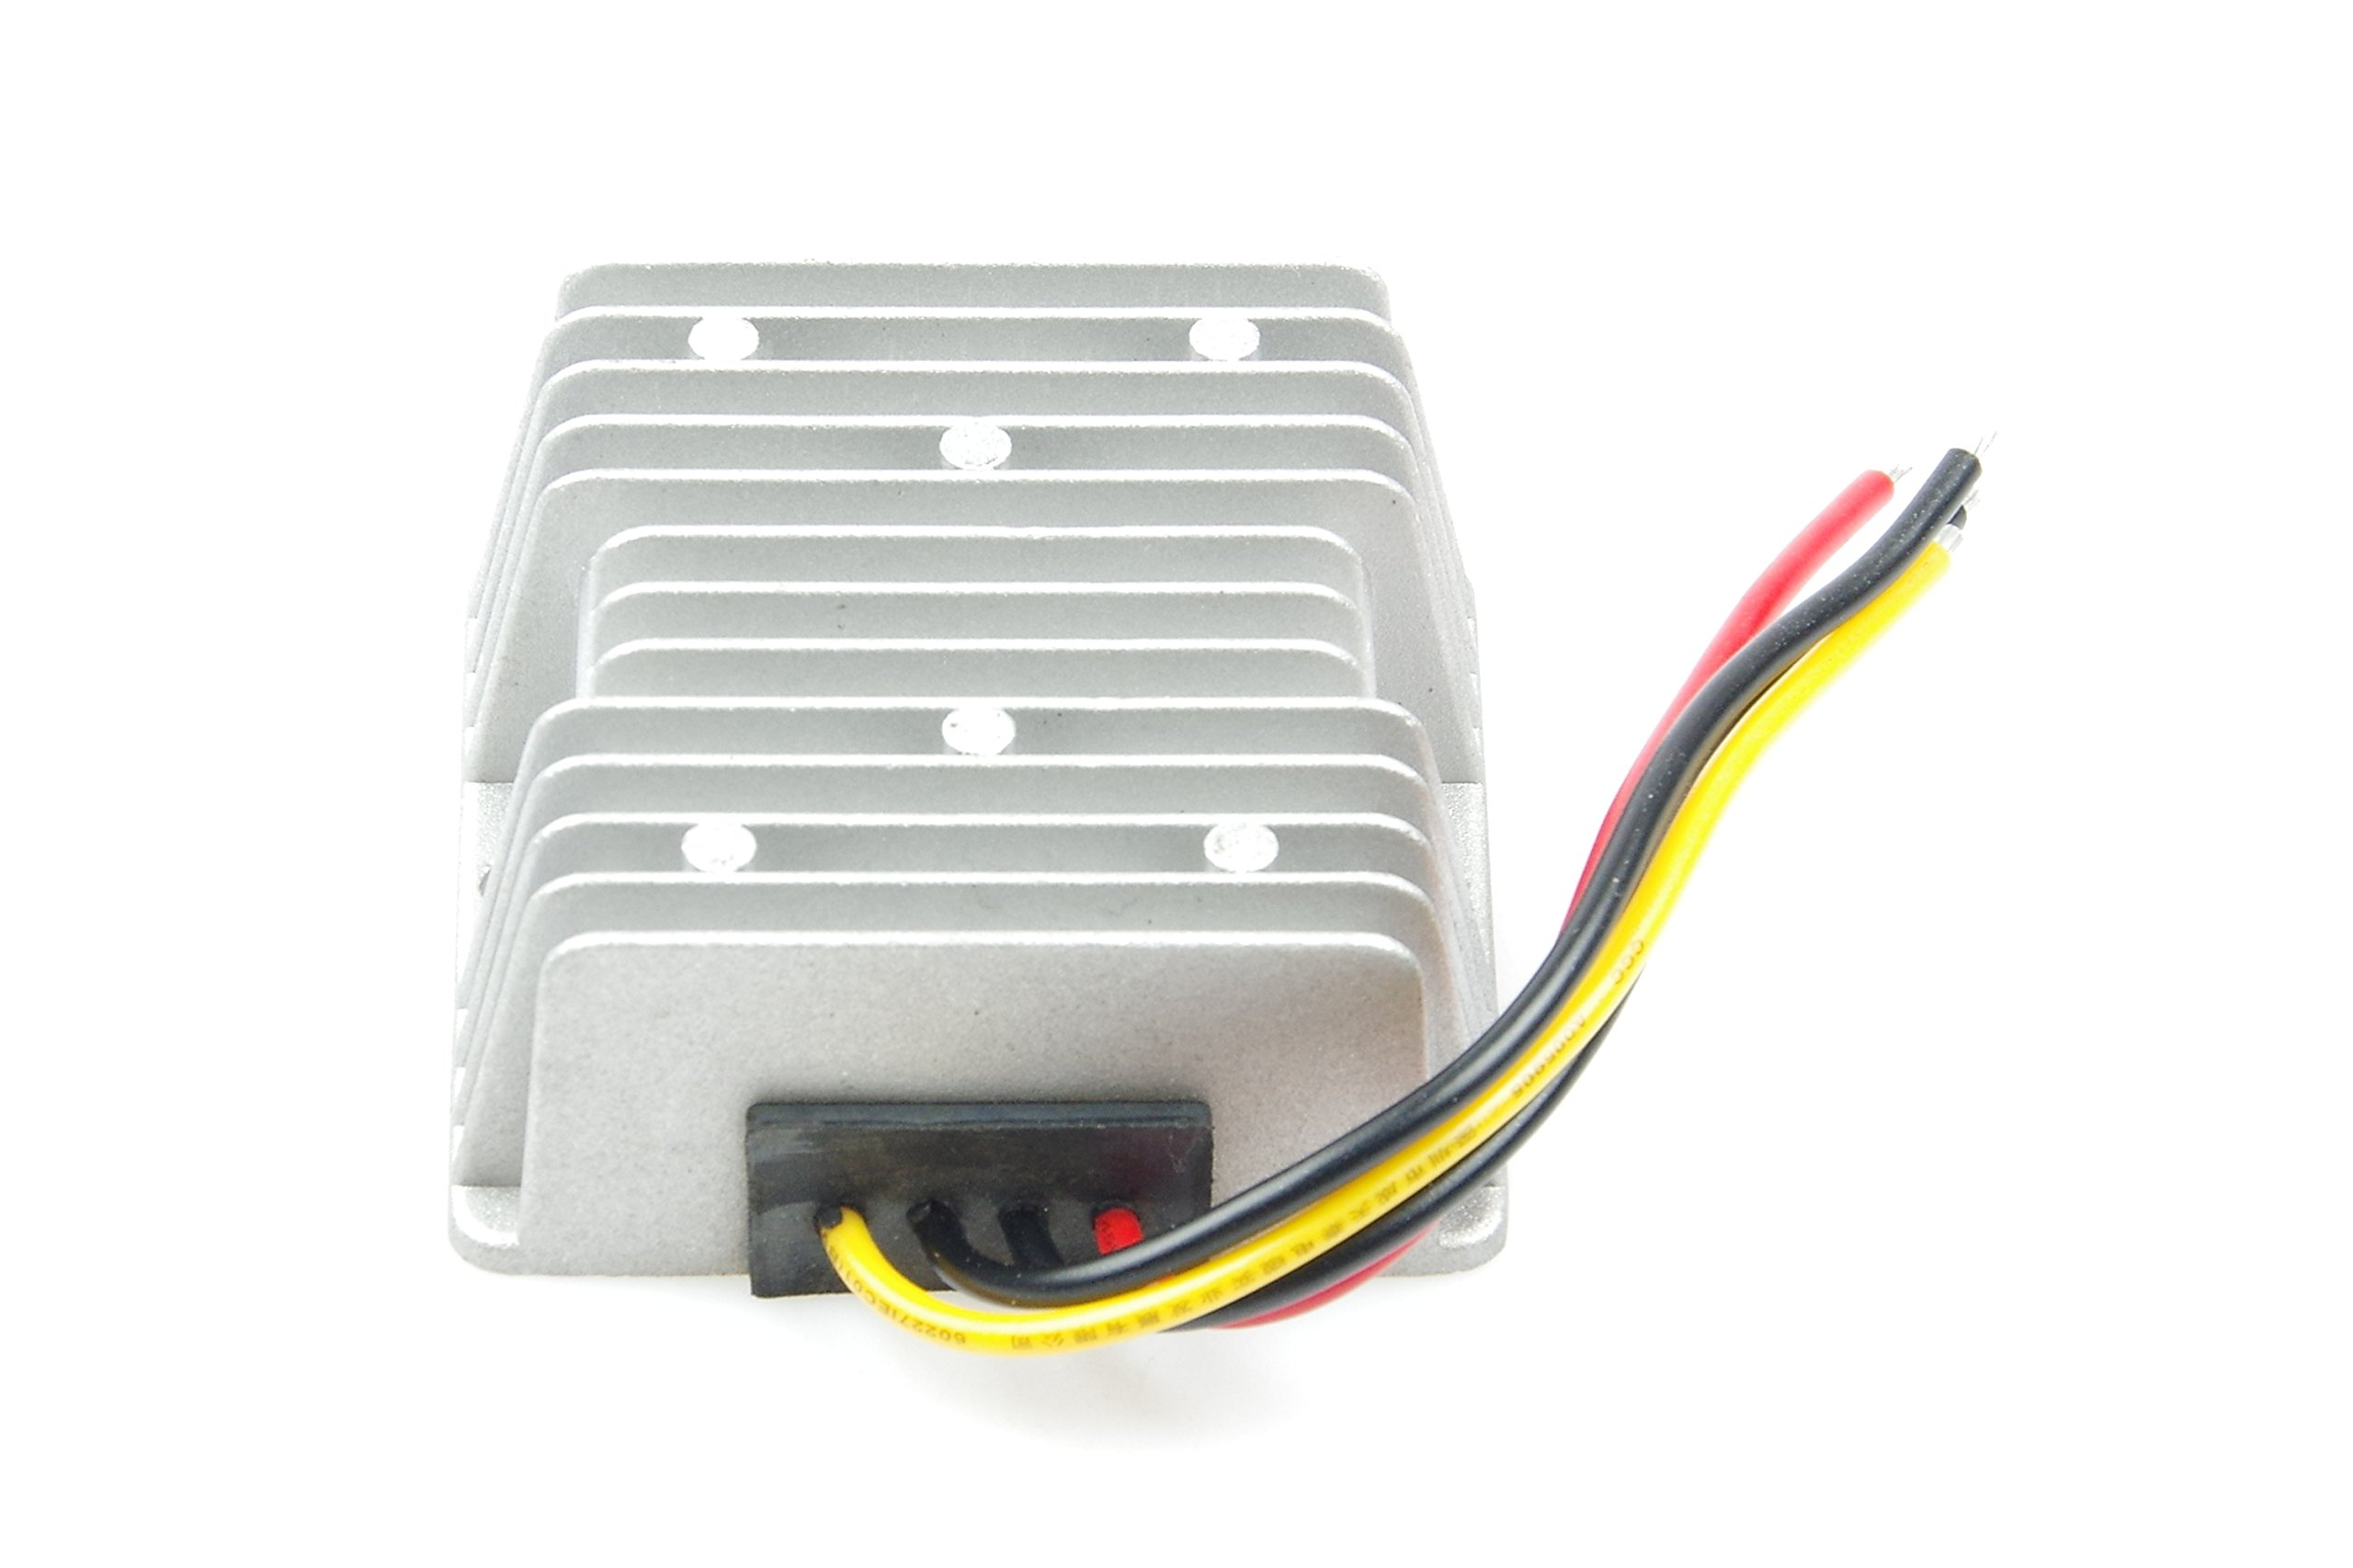 Voltage Converter Regulator DC/DC DC12V 24V 36V (8-40V) Convert to DC 13.8V 8A 110W Buck Transformer Waterproof